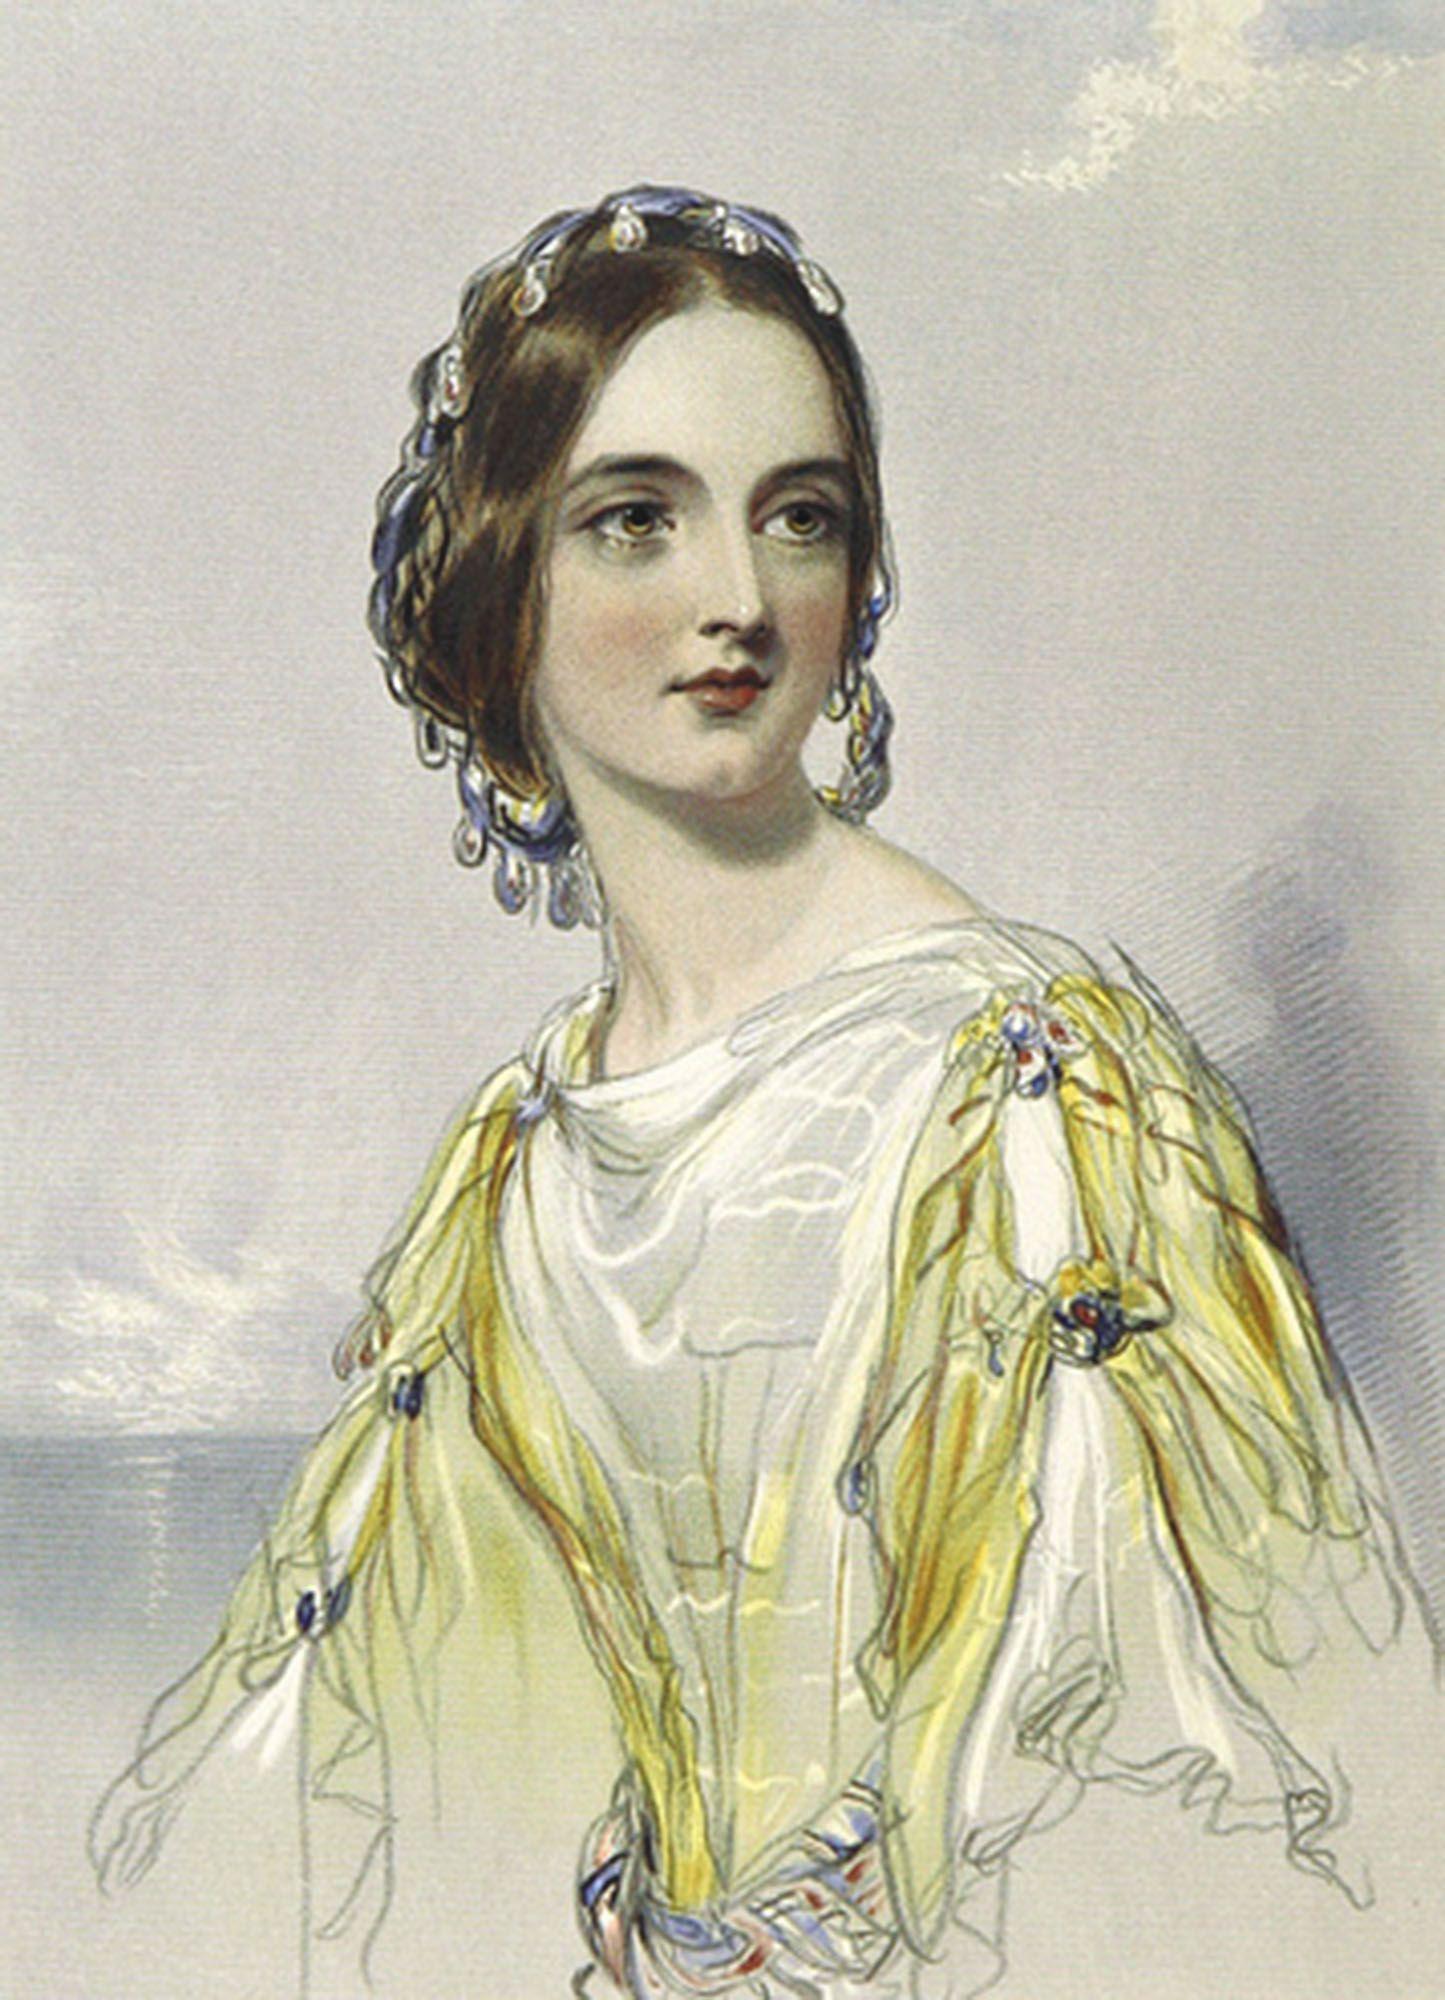 Yellow dress for women  Woman Half Portrait Wearing a Yellow Dress  Vintage Women Images